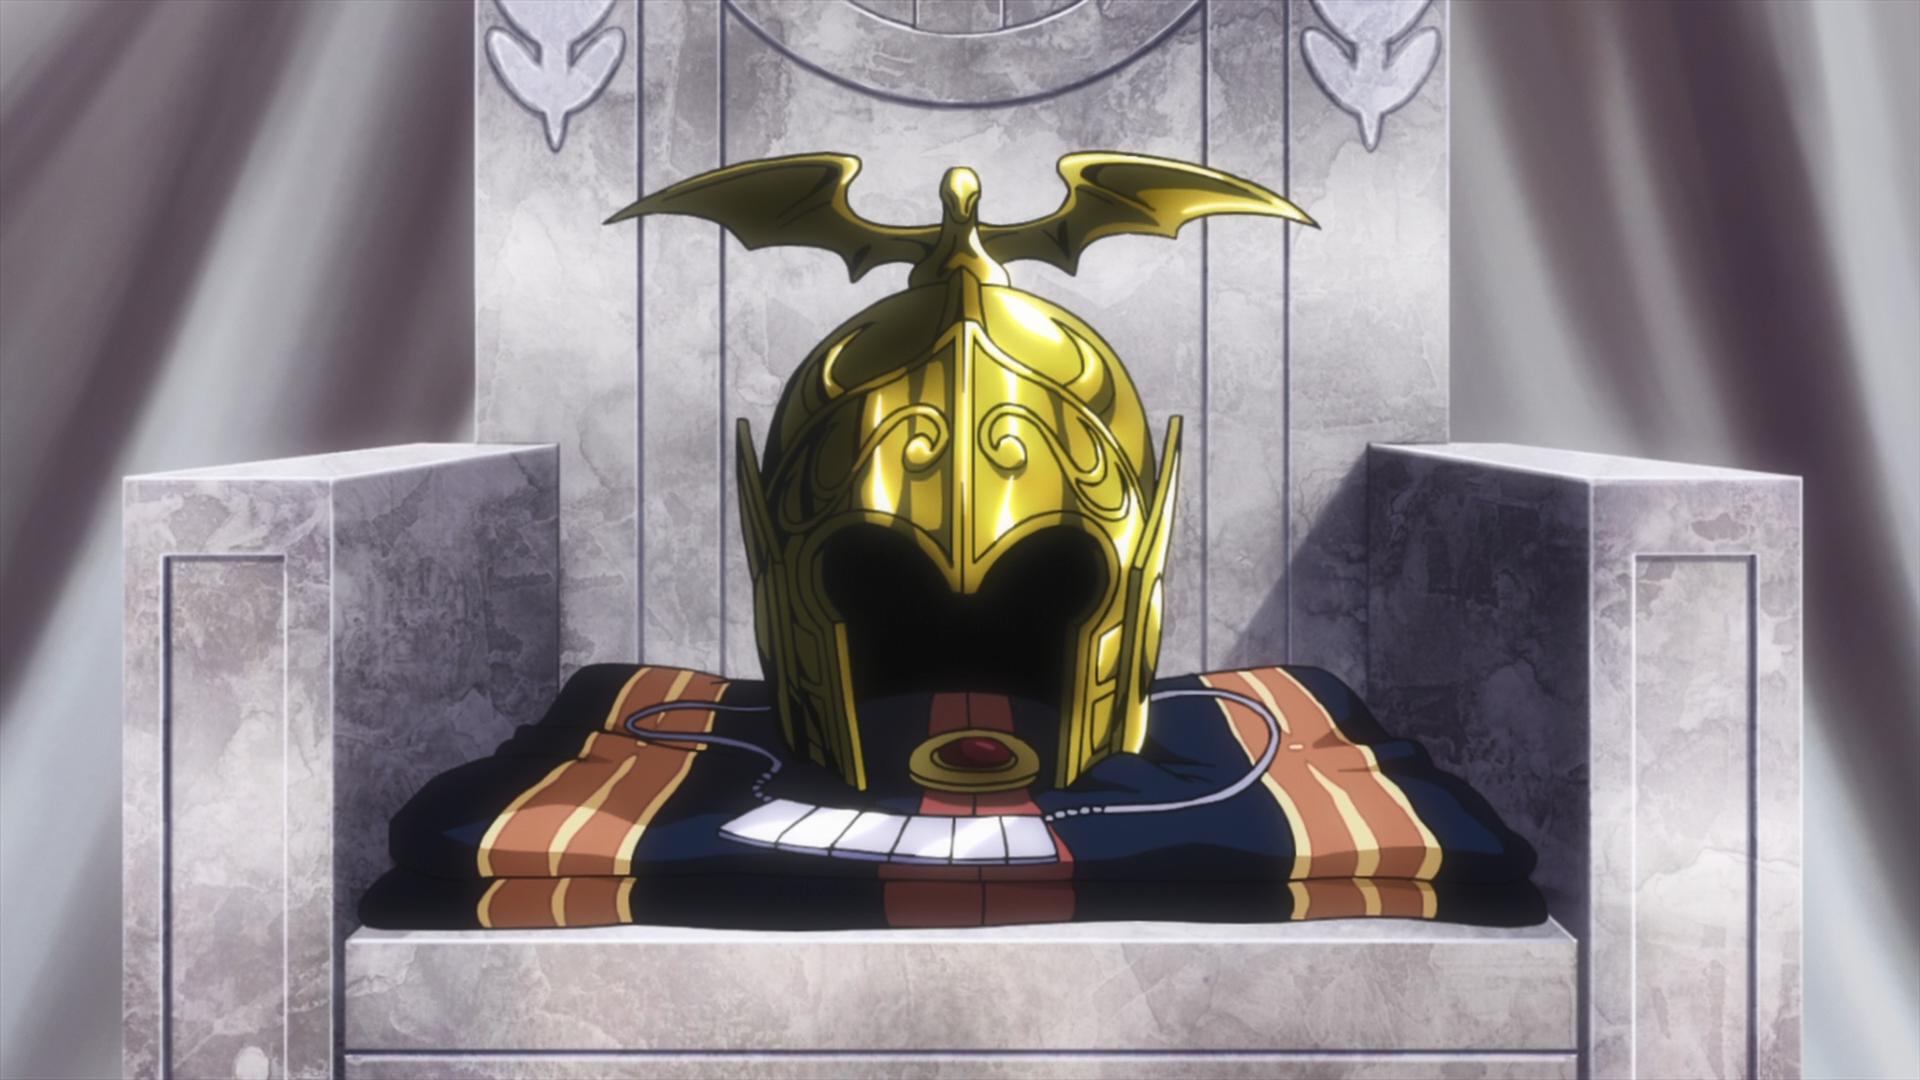 Grande Mestre Seiya Universe Wiki Fandom